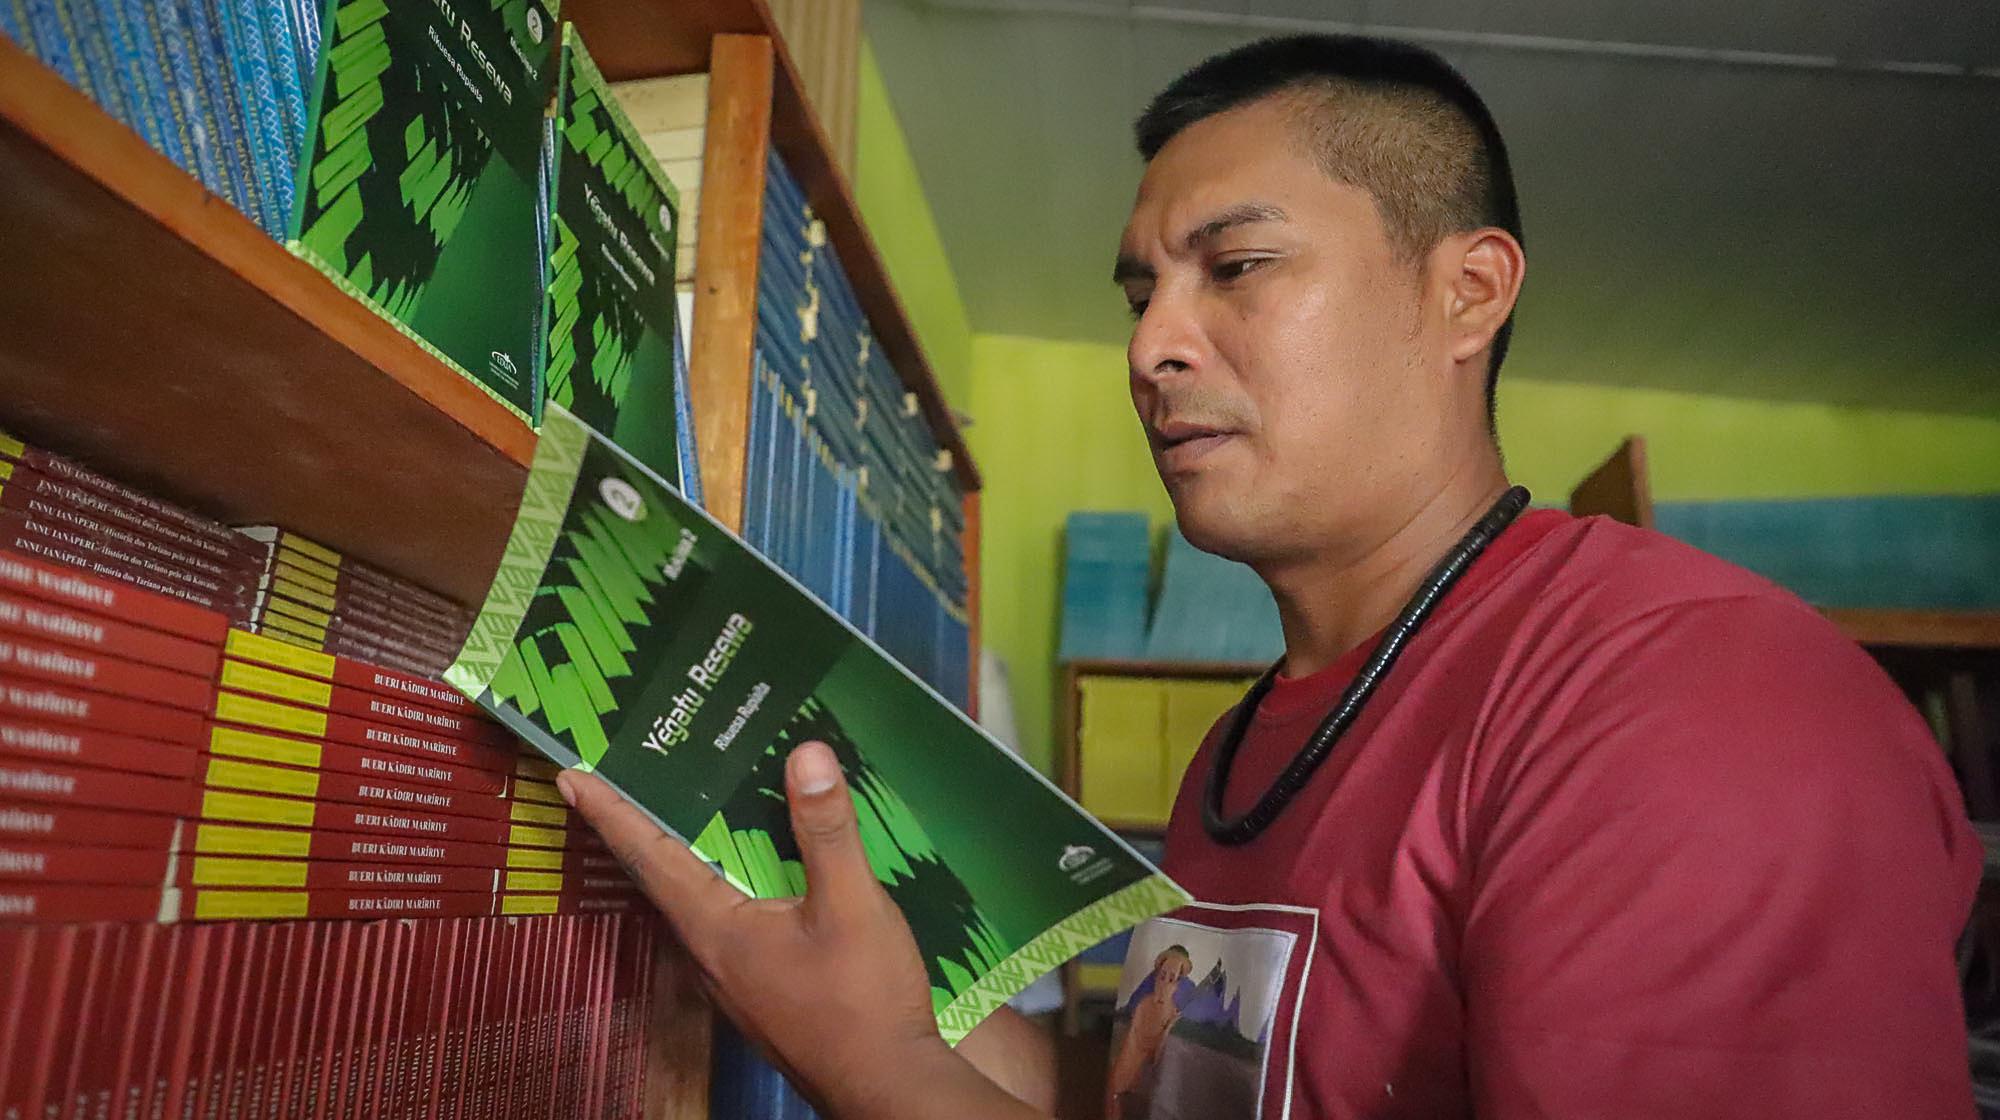 Indígenas querem fundar a 1ª Academia da Língua Nheengatu